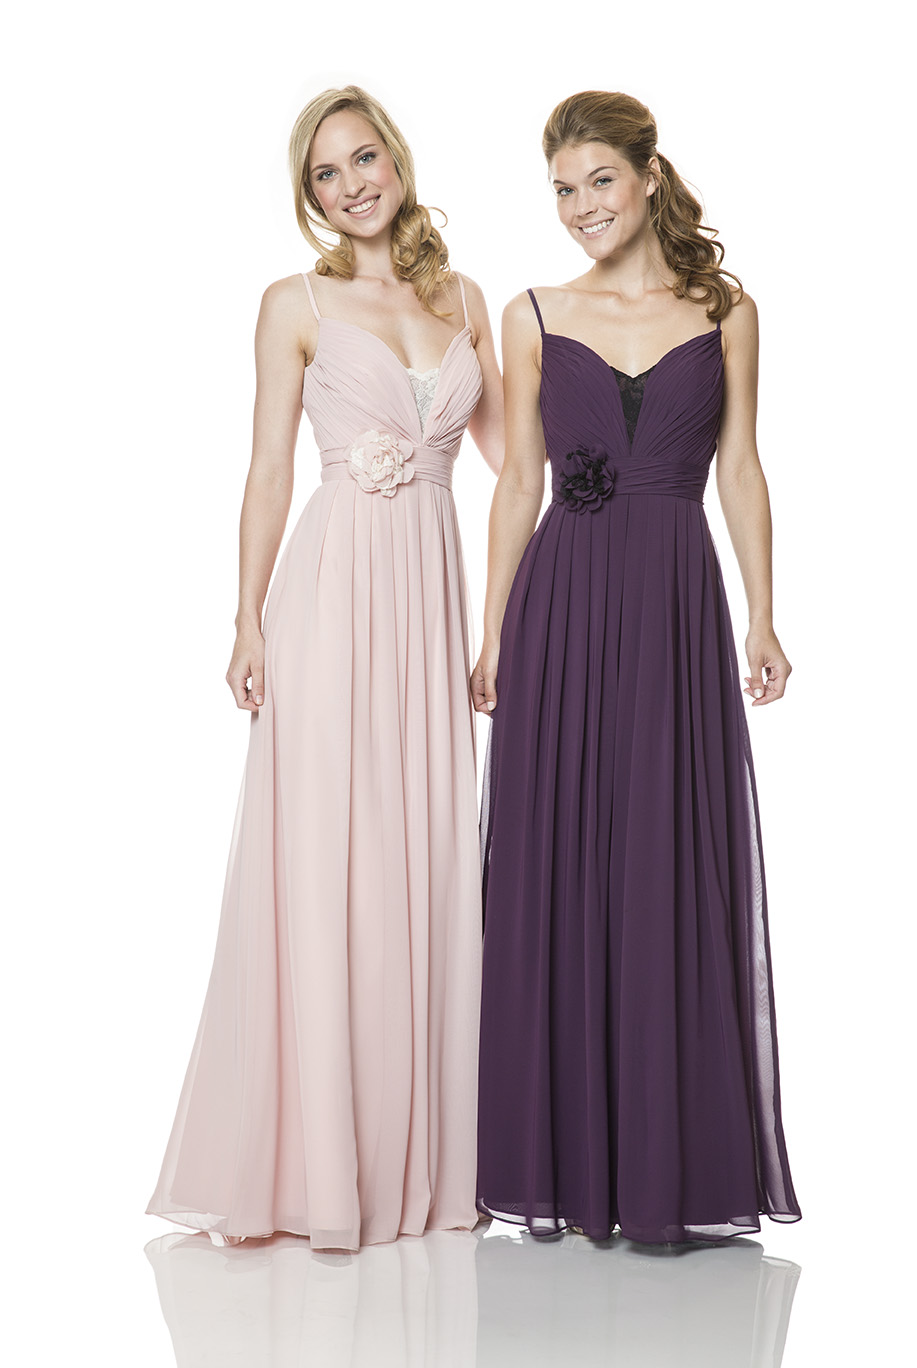 2665add26d2d Buy Spaghetti Staps Sweetheart Sleeveless Floor Length Pink Purple  Bridesmaid Dress Vestido Longo De Festa Rosa,BD051 in Cheap Price on  m.alibaba.com